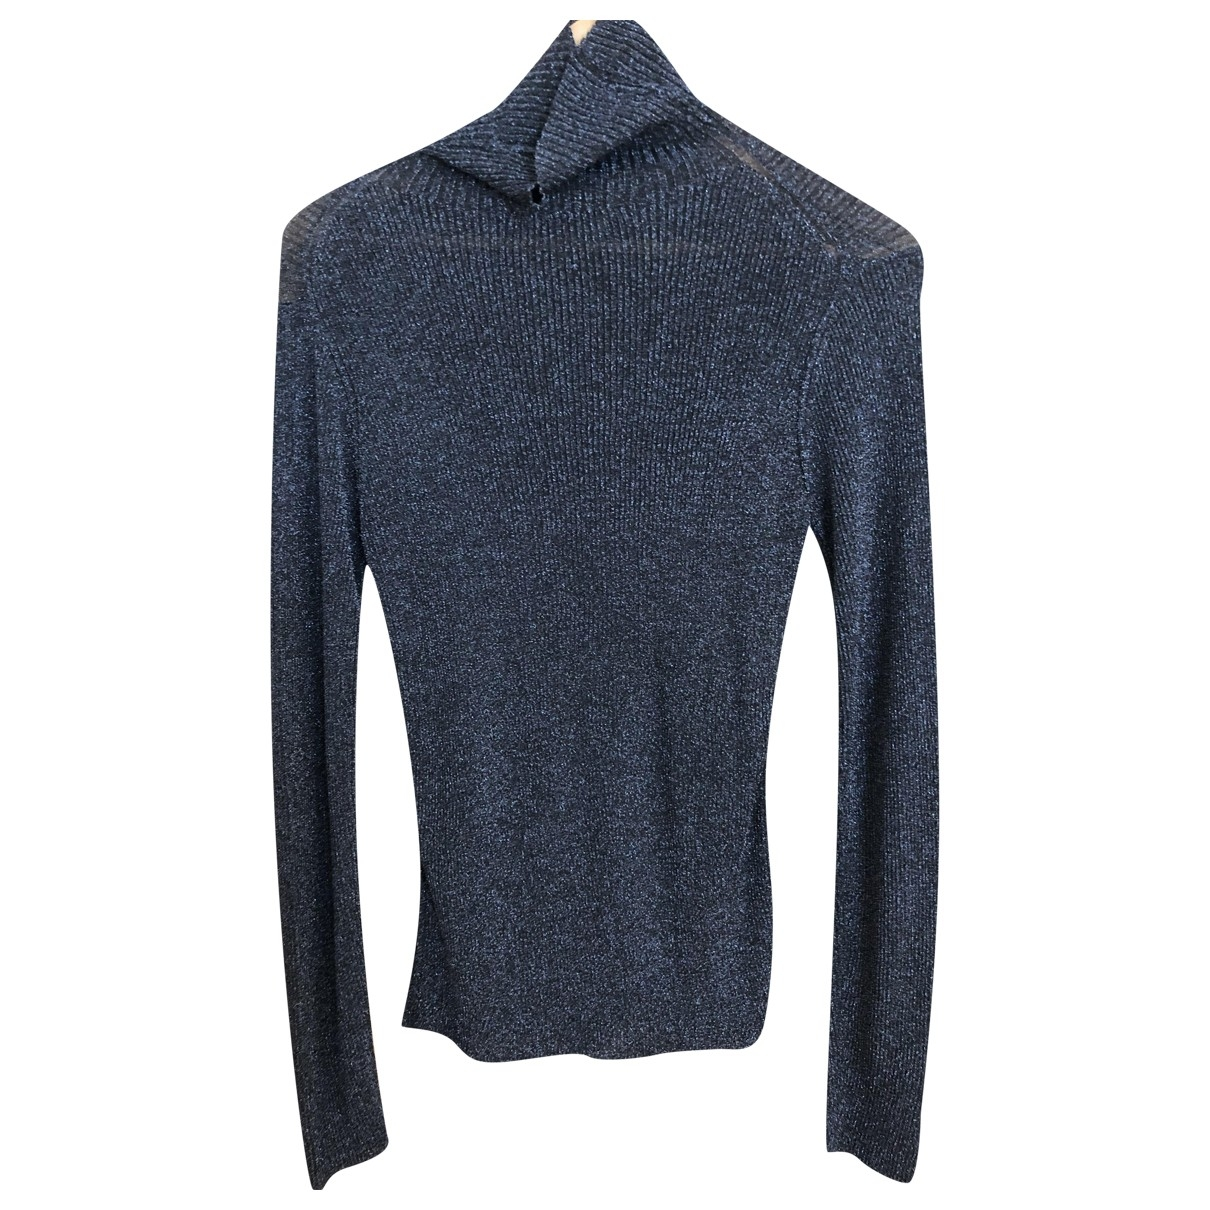 3.1 Phillip Lim \N Black Knitwear for Women L International